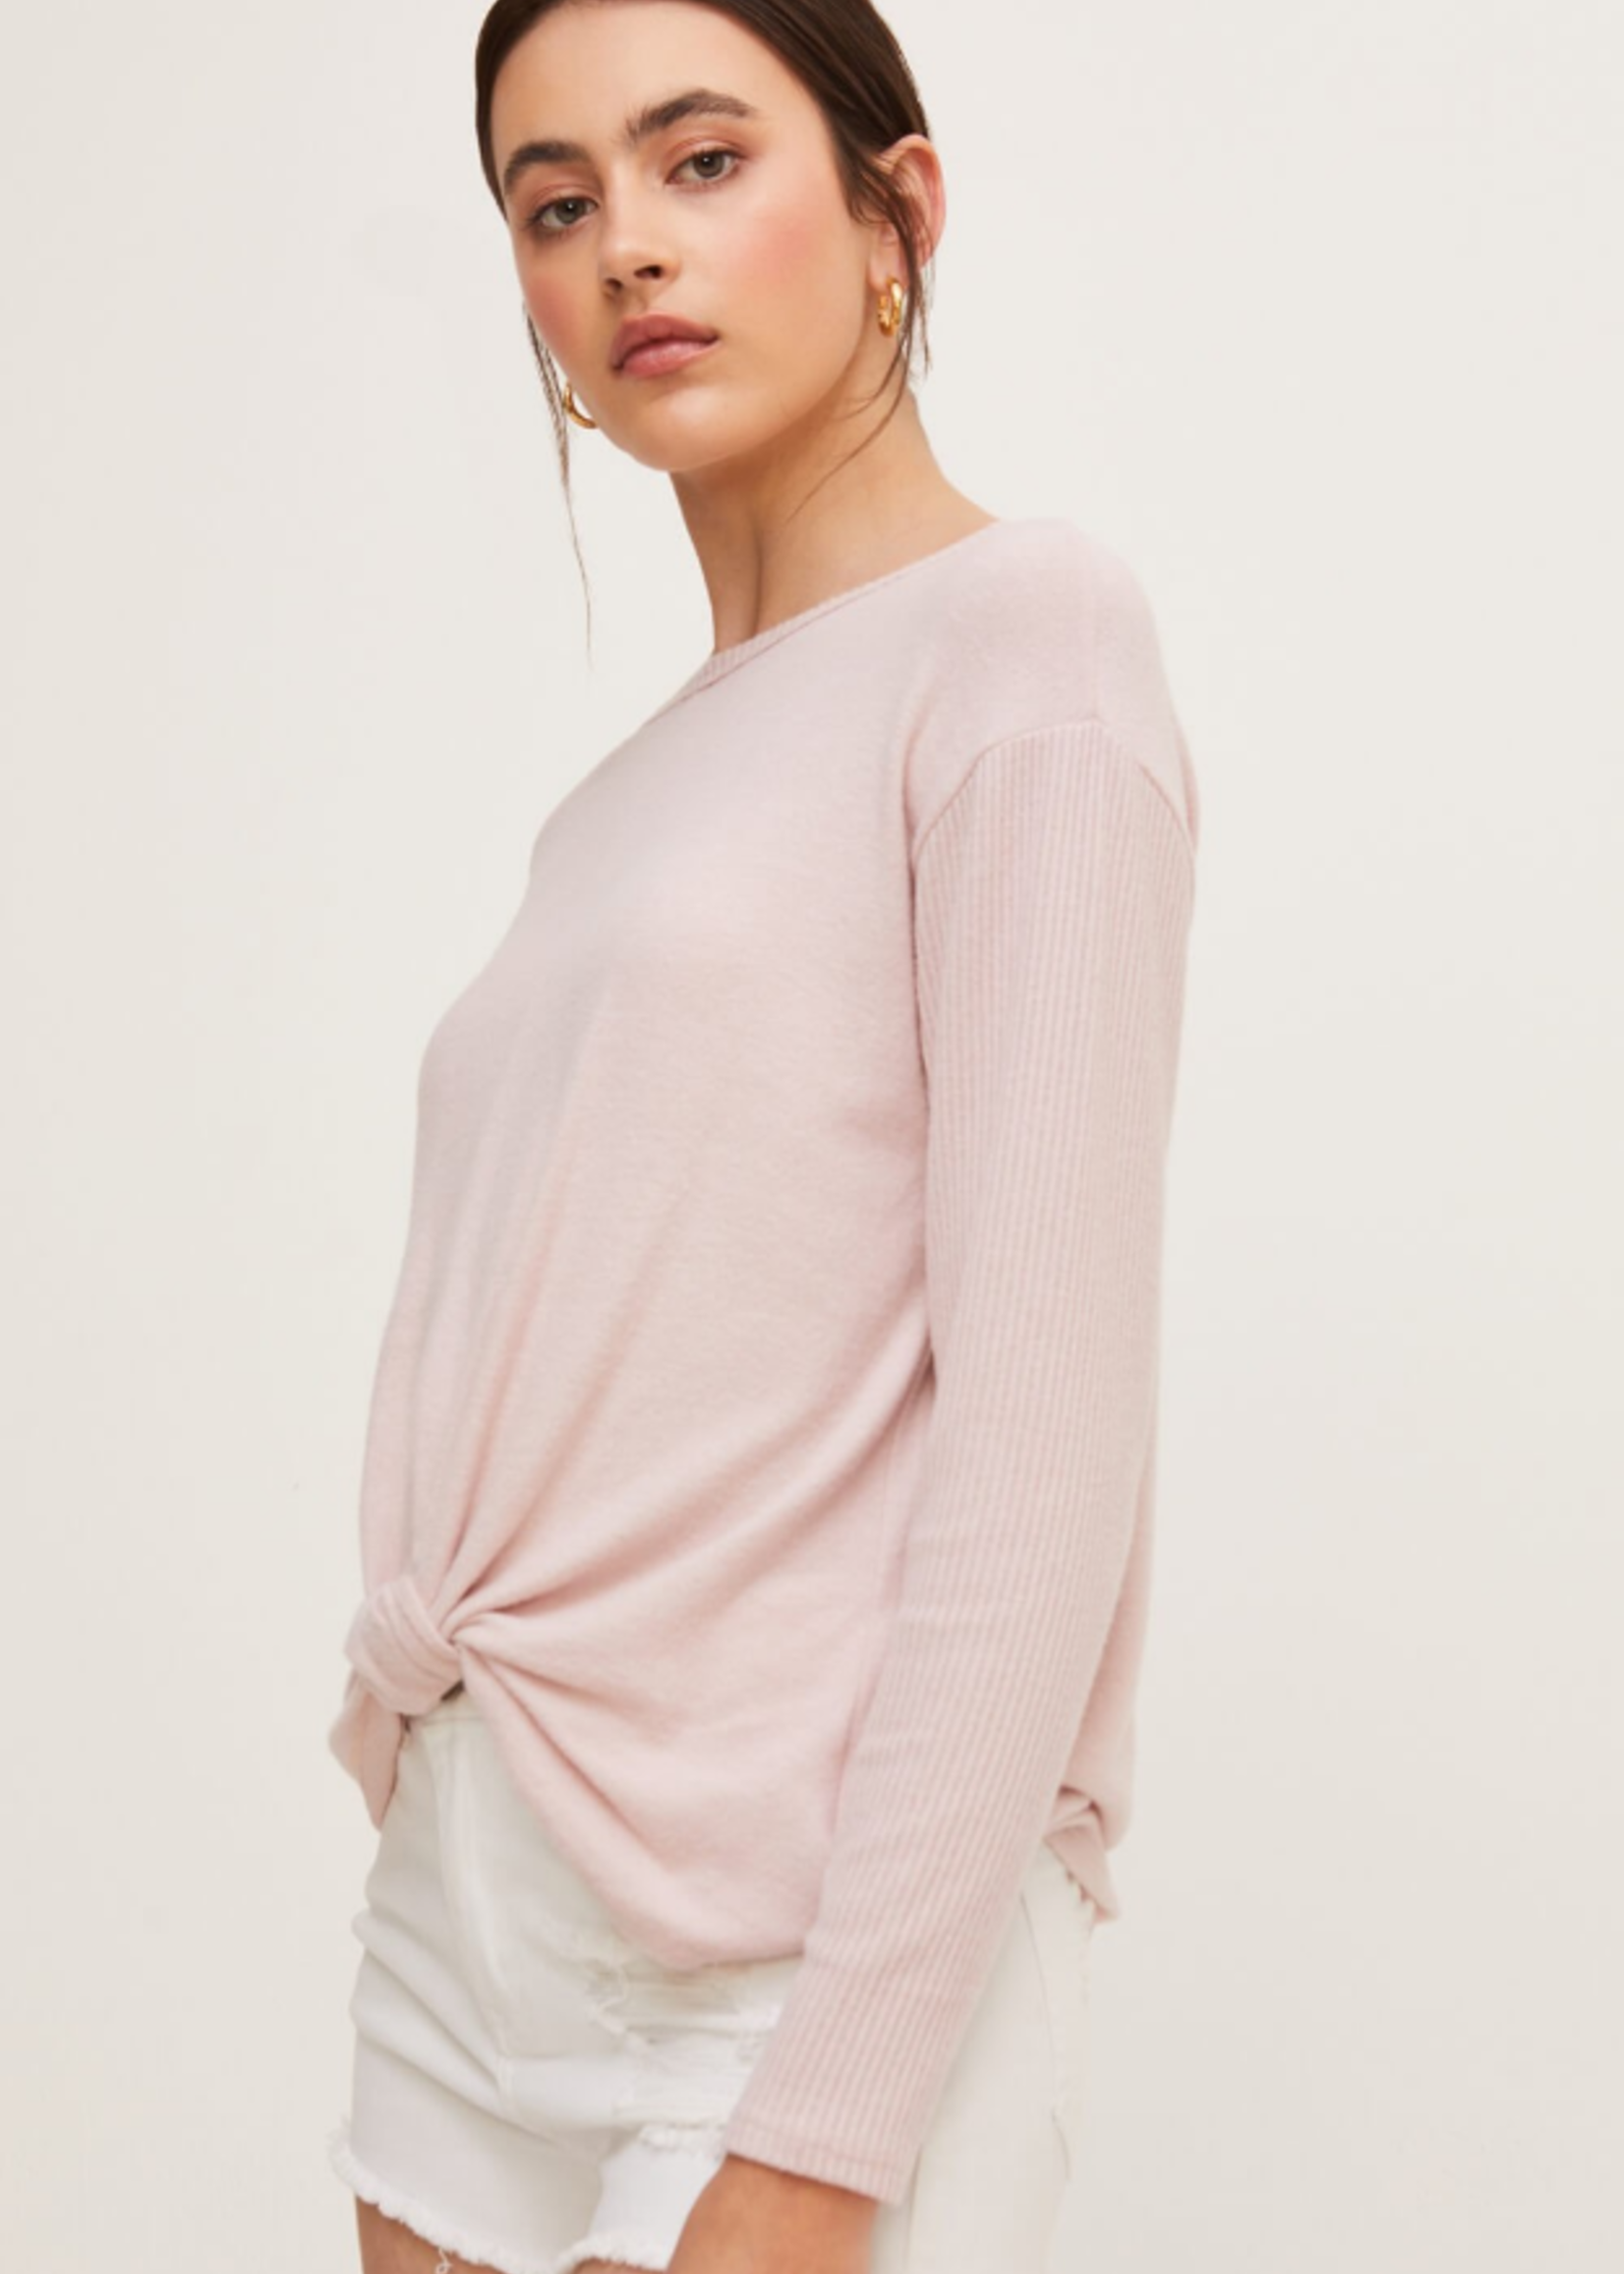 Lush Long Sleeve Top with Bottom Twist - Mauve